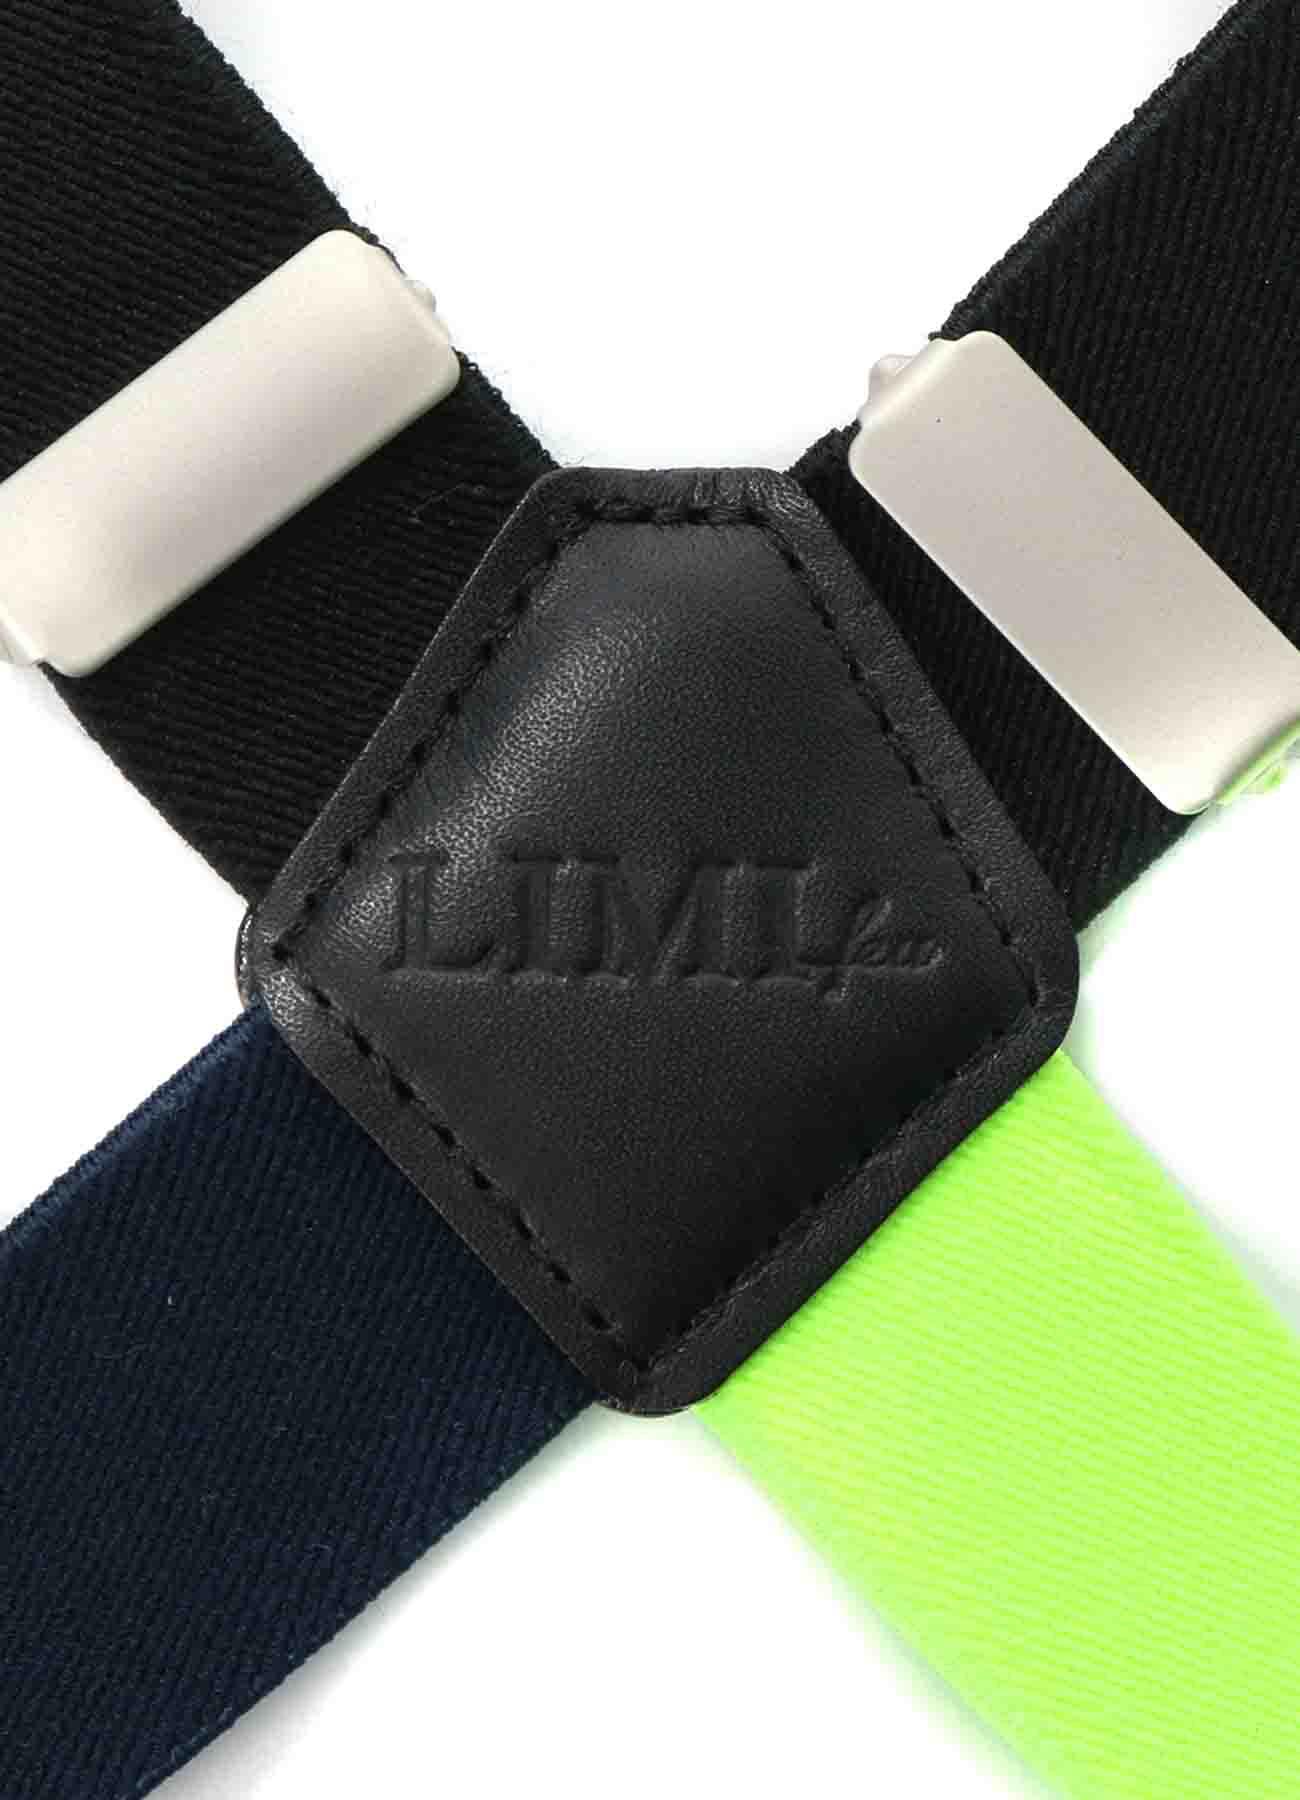 Woolly Rubber Design Suspenders